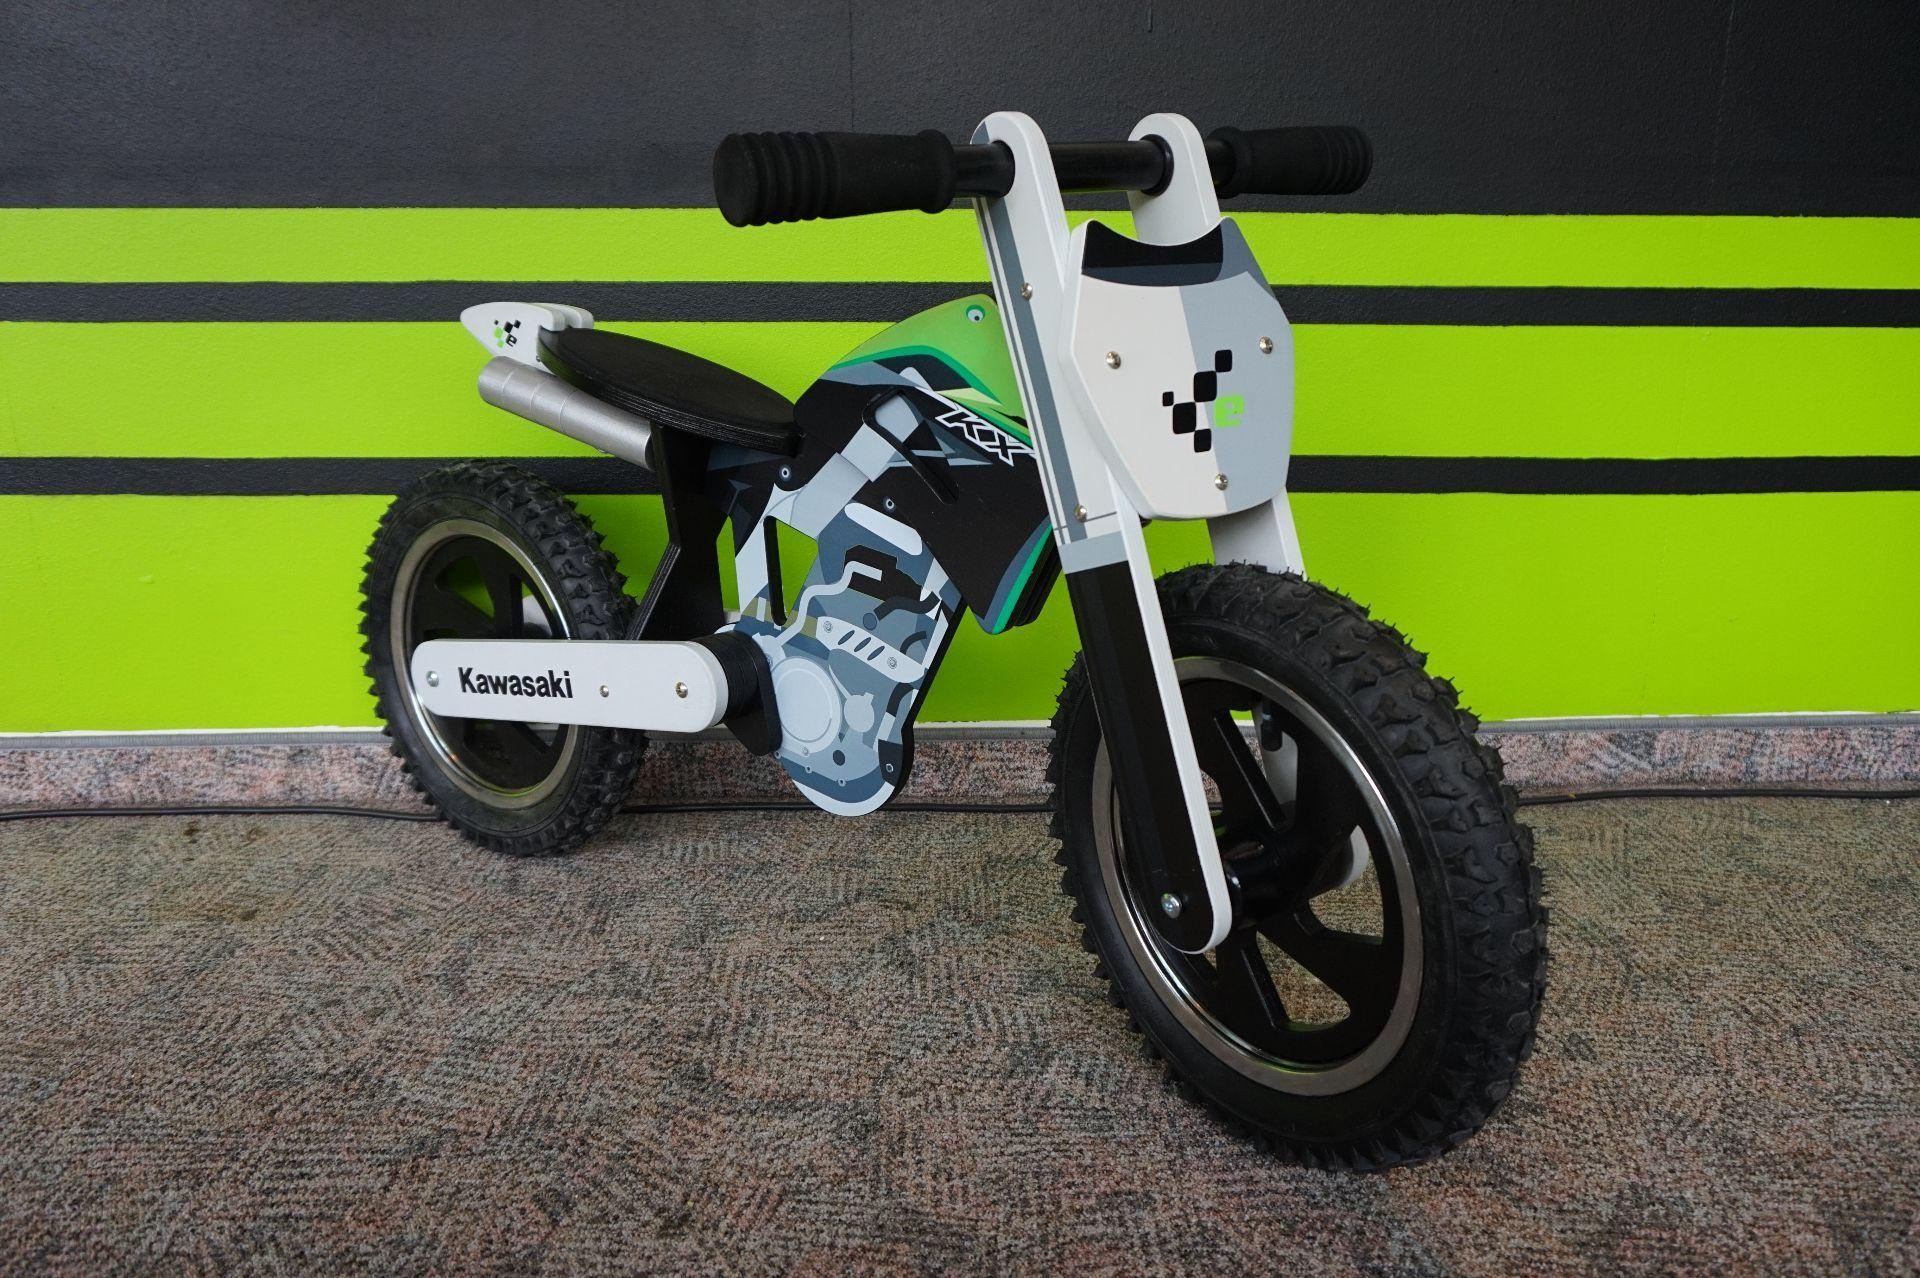 moto neuve acheter kawasaki spezial kiddy moto kx450f. Black Bedroom Furniture Sets. Home Design Ideas